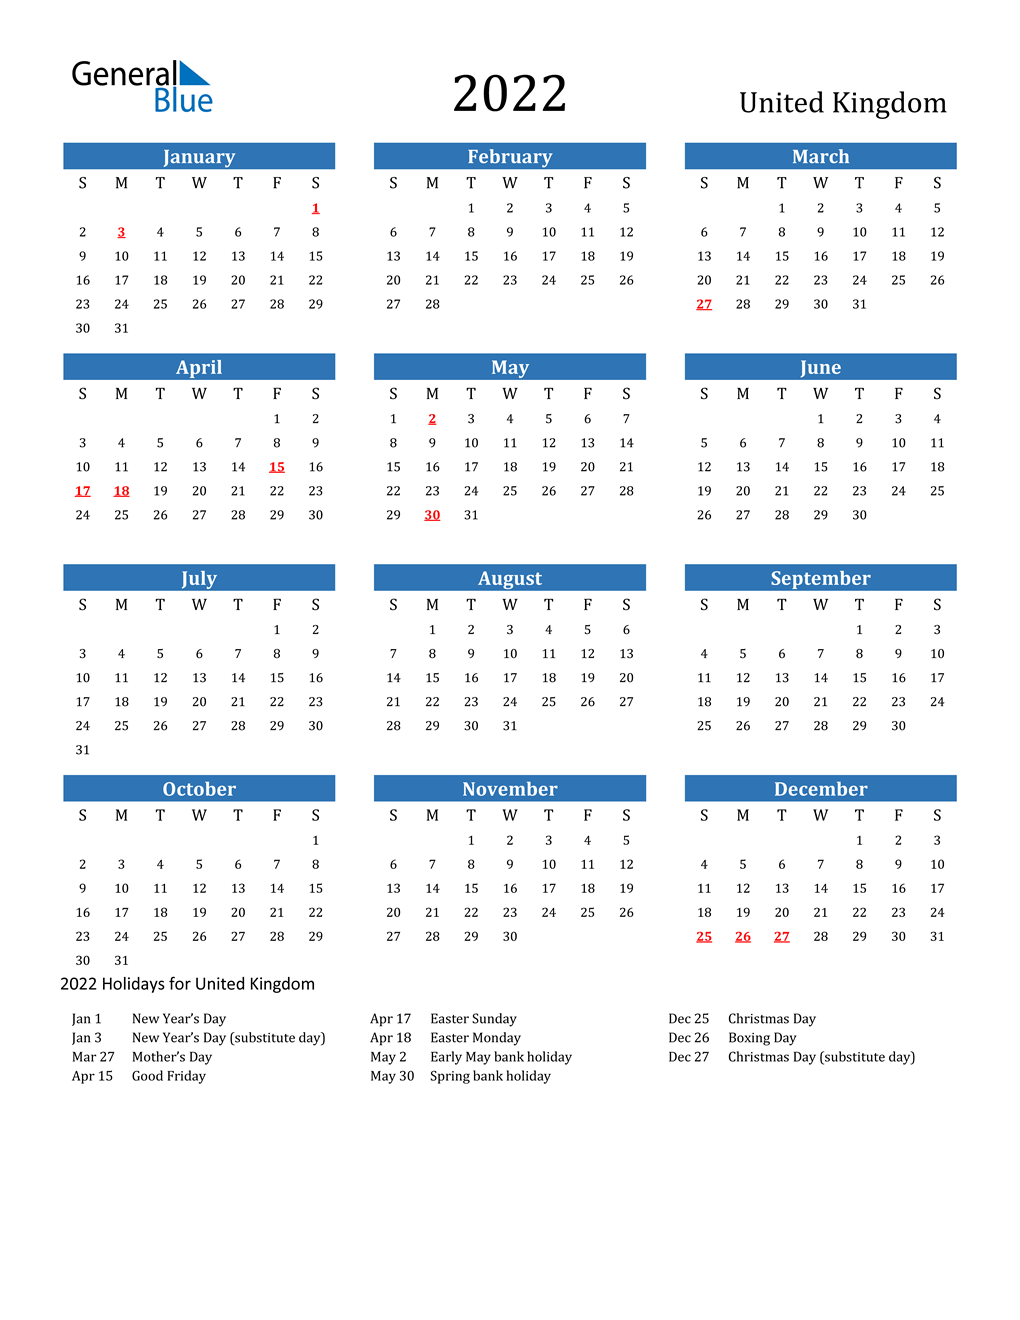 Calendar 2022 Printable With Holidays.2022 United Kingdom Calendar With Holidays